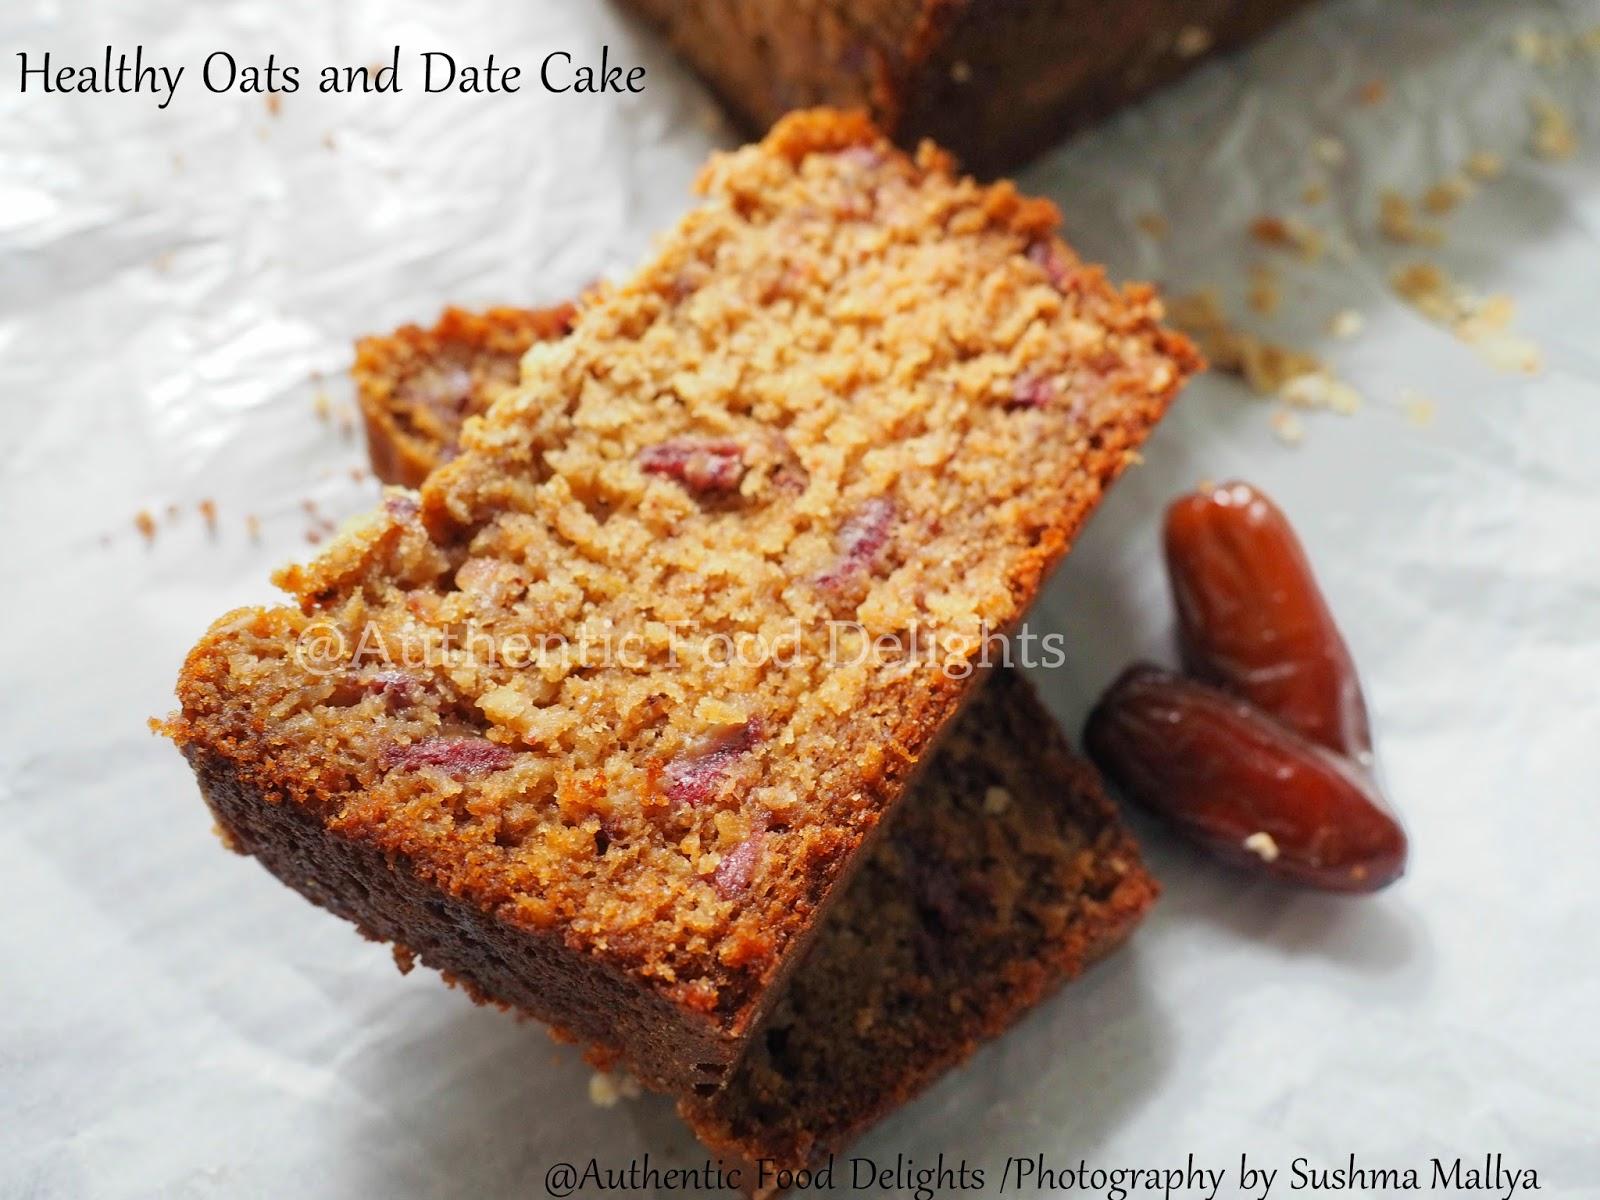 Recipe For Date Cake For Diabetics